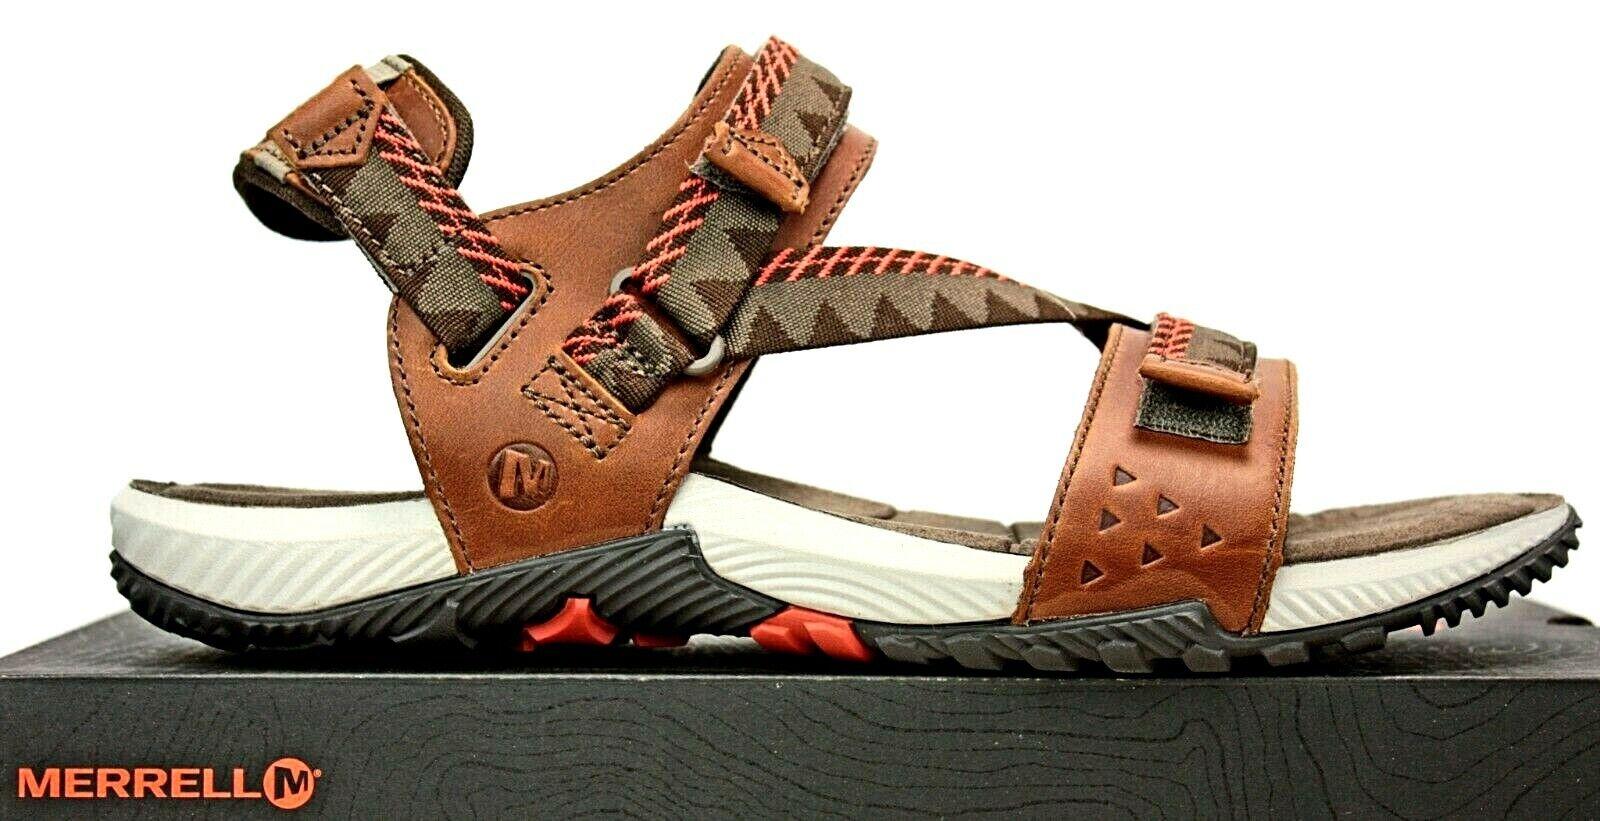 Merrell Mens Sport Sandals Brown Leather Beachcombers FW469 IB